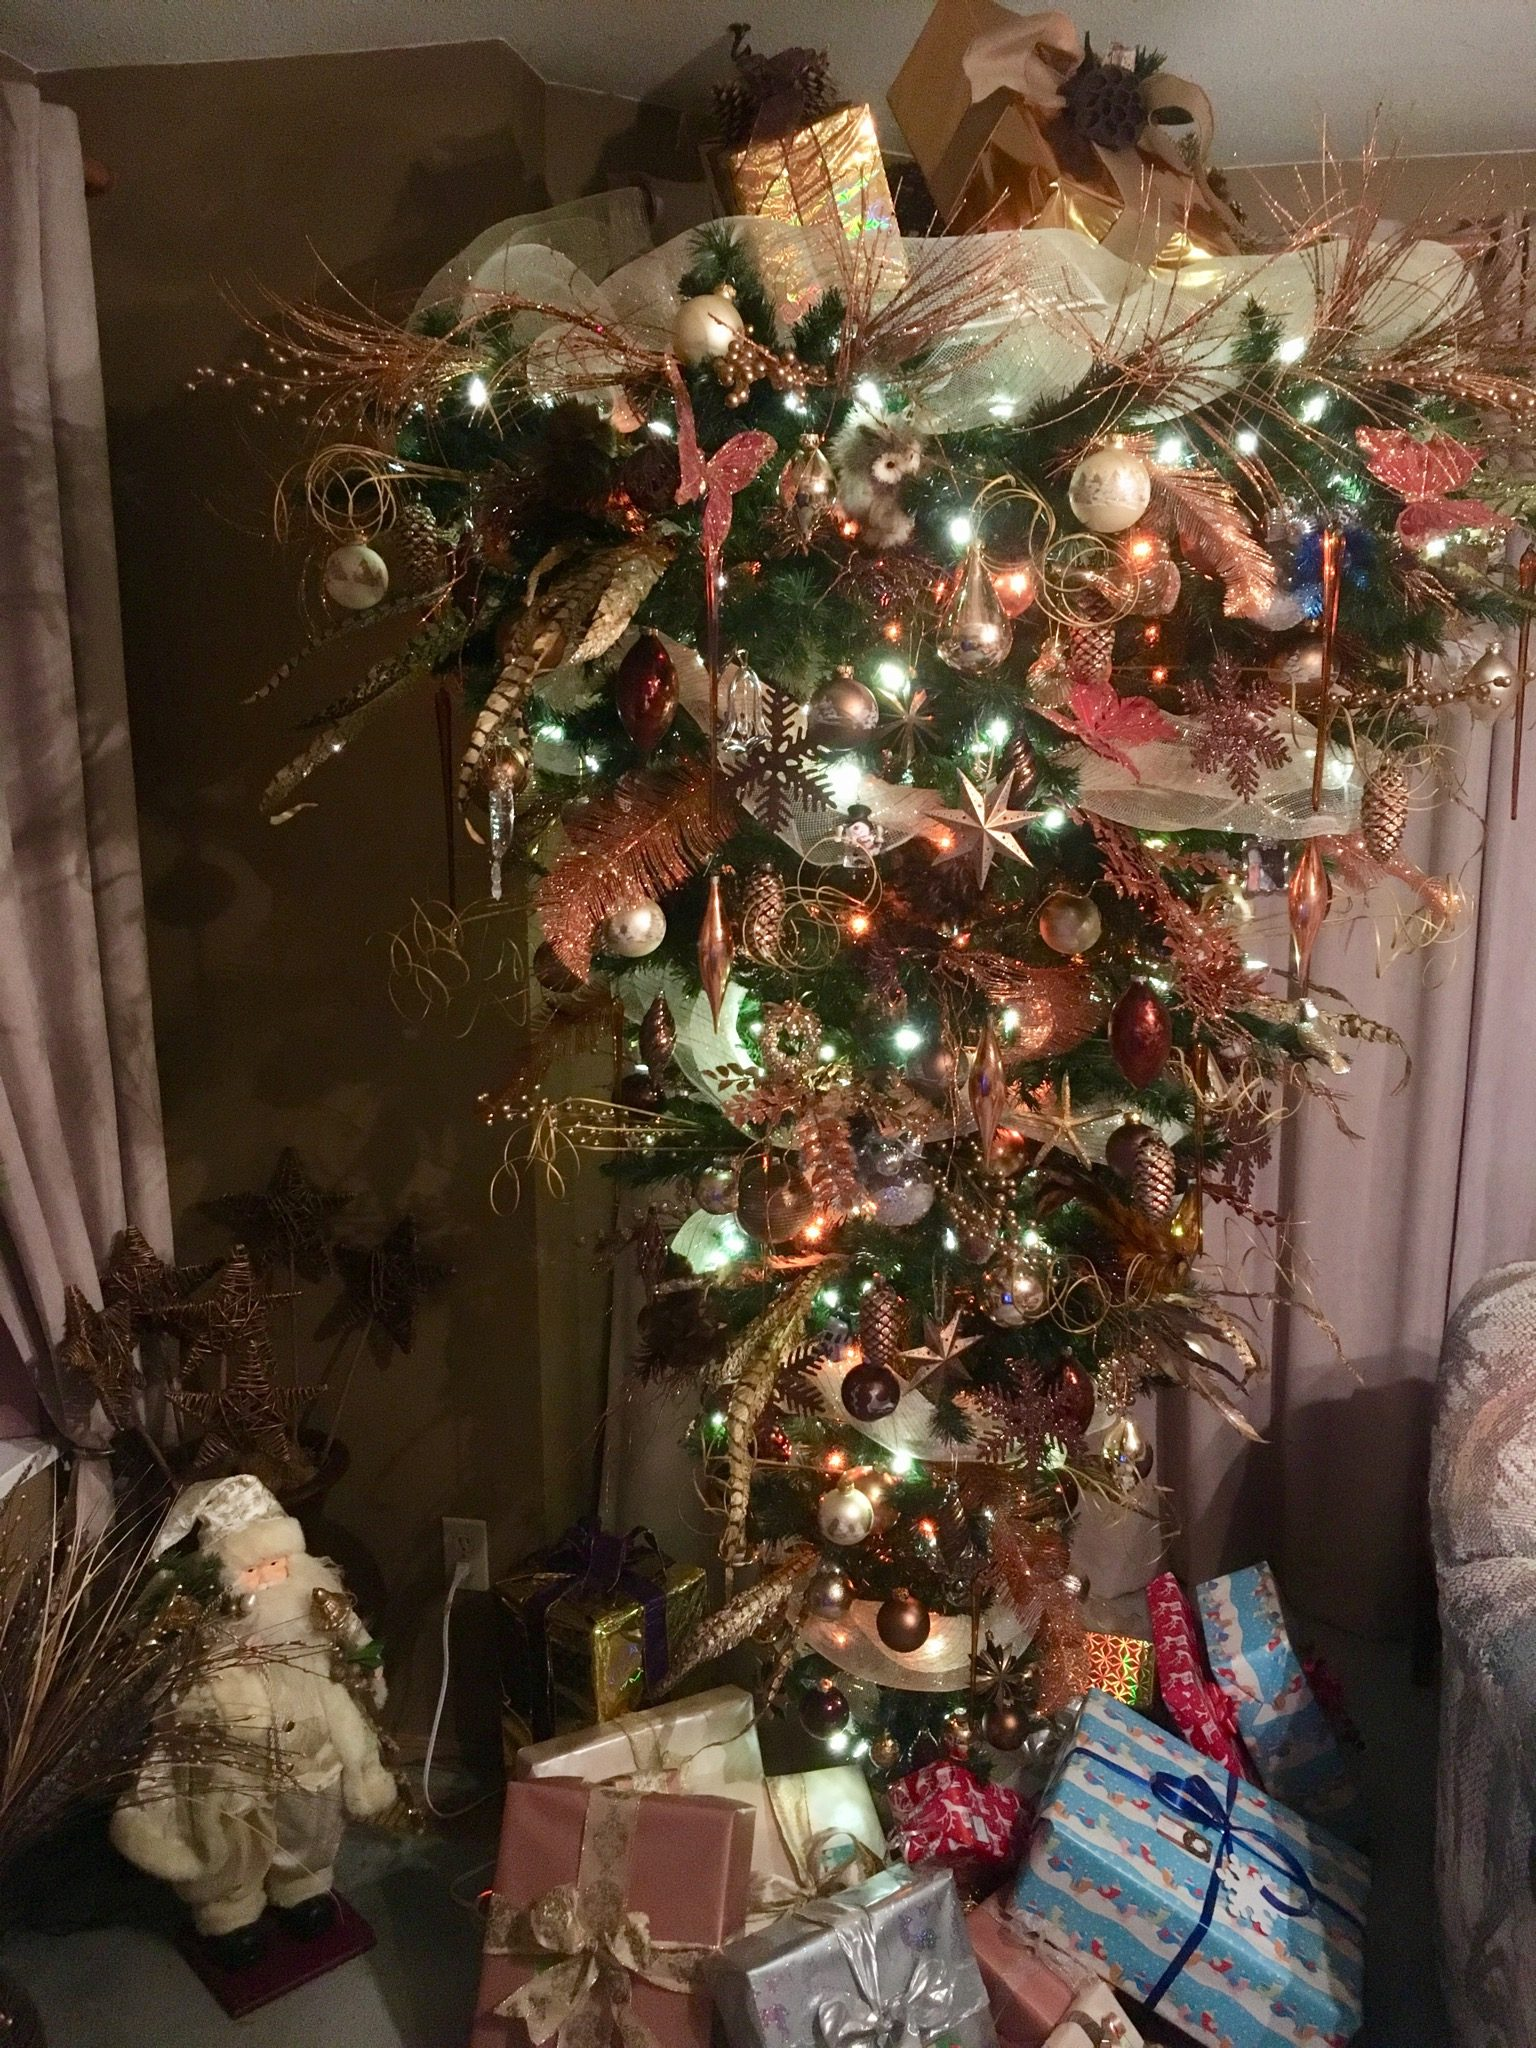 Deck the halls - upside down Christmas tree